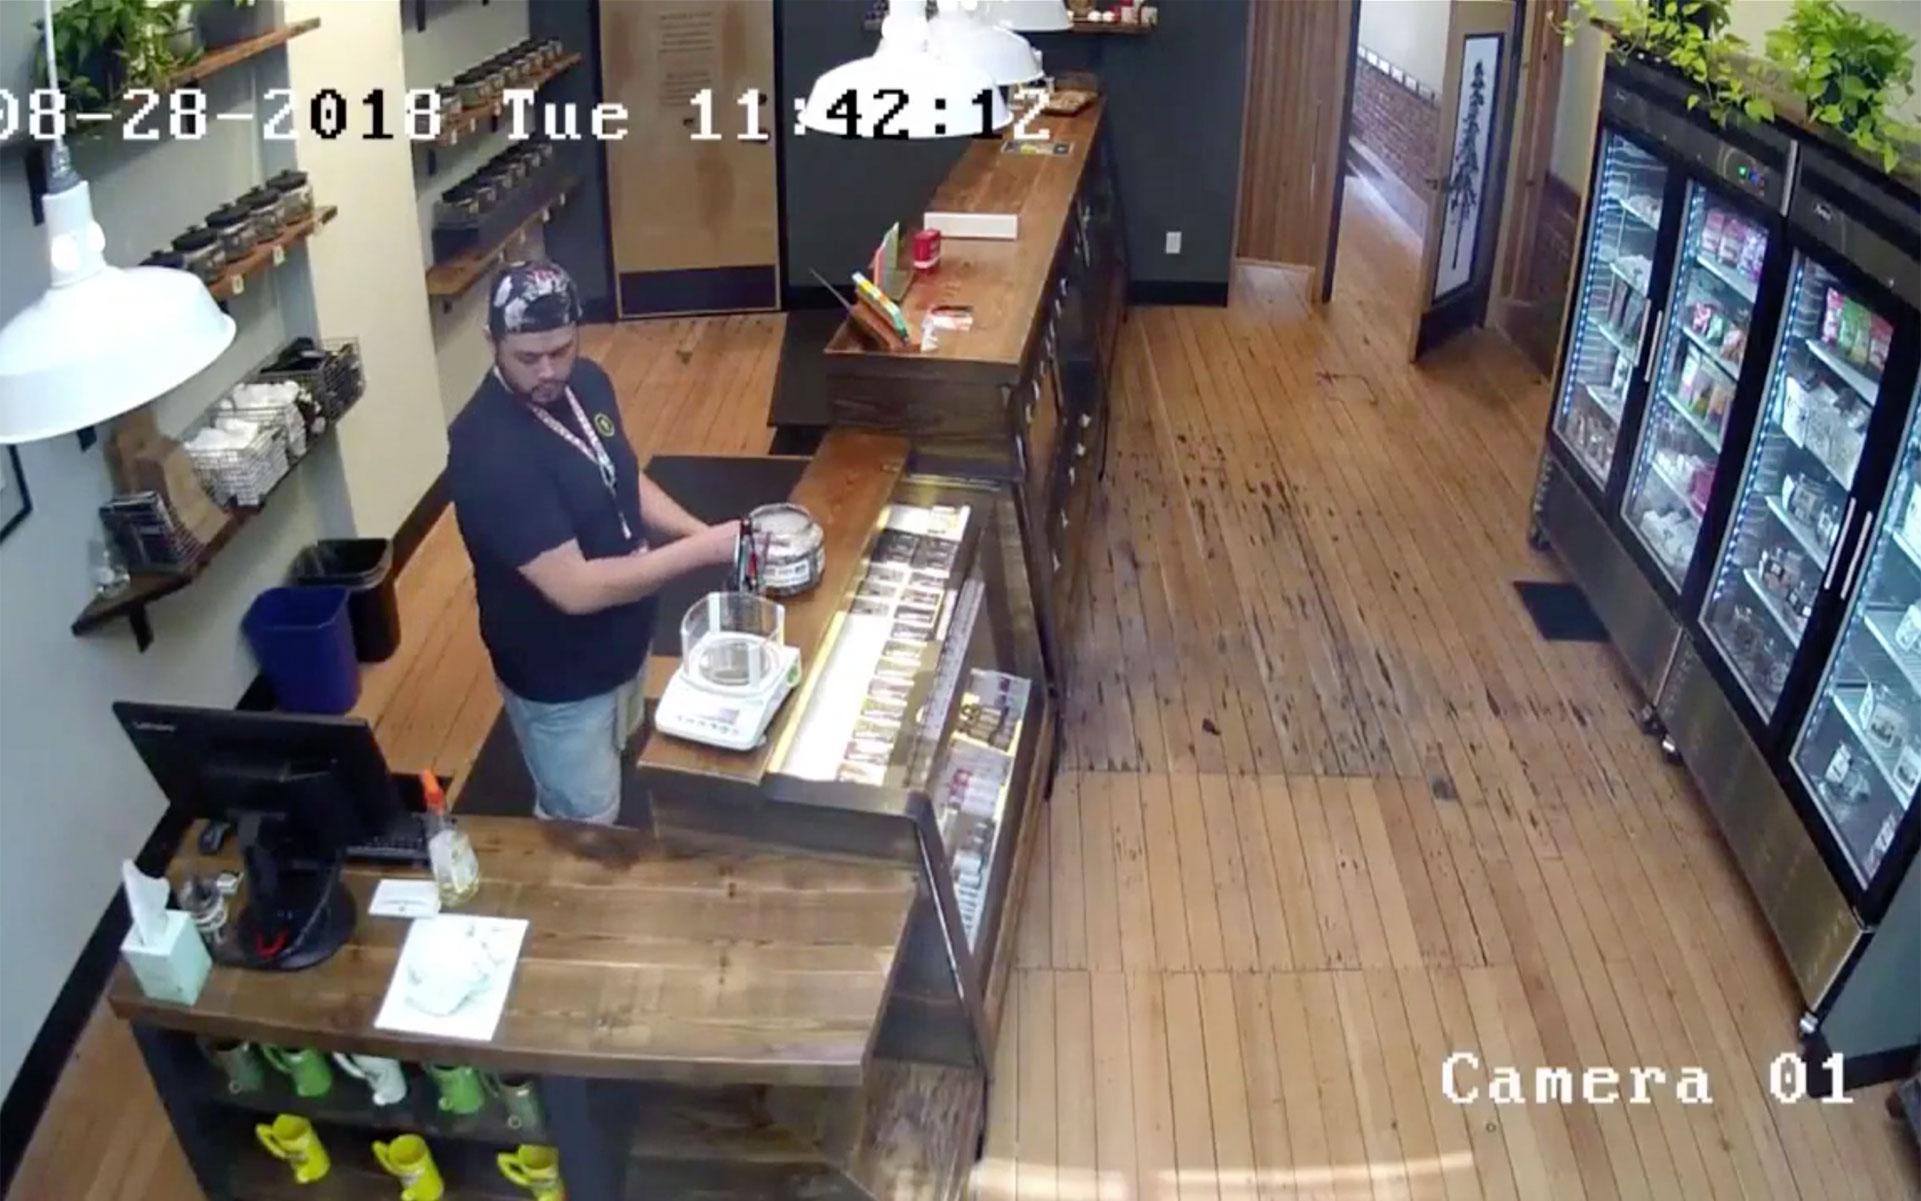 Paranormal Activity Spooks Oregon Dispensary Staff thumbnail